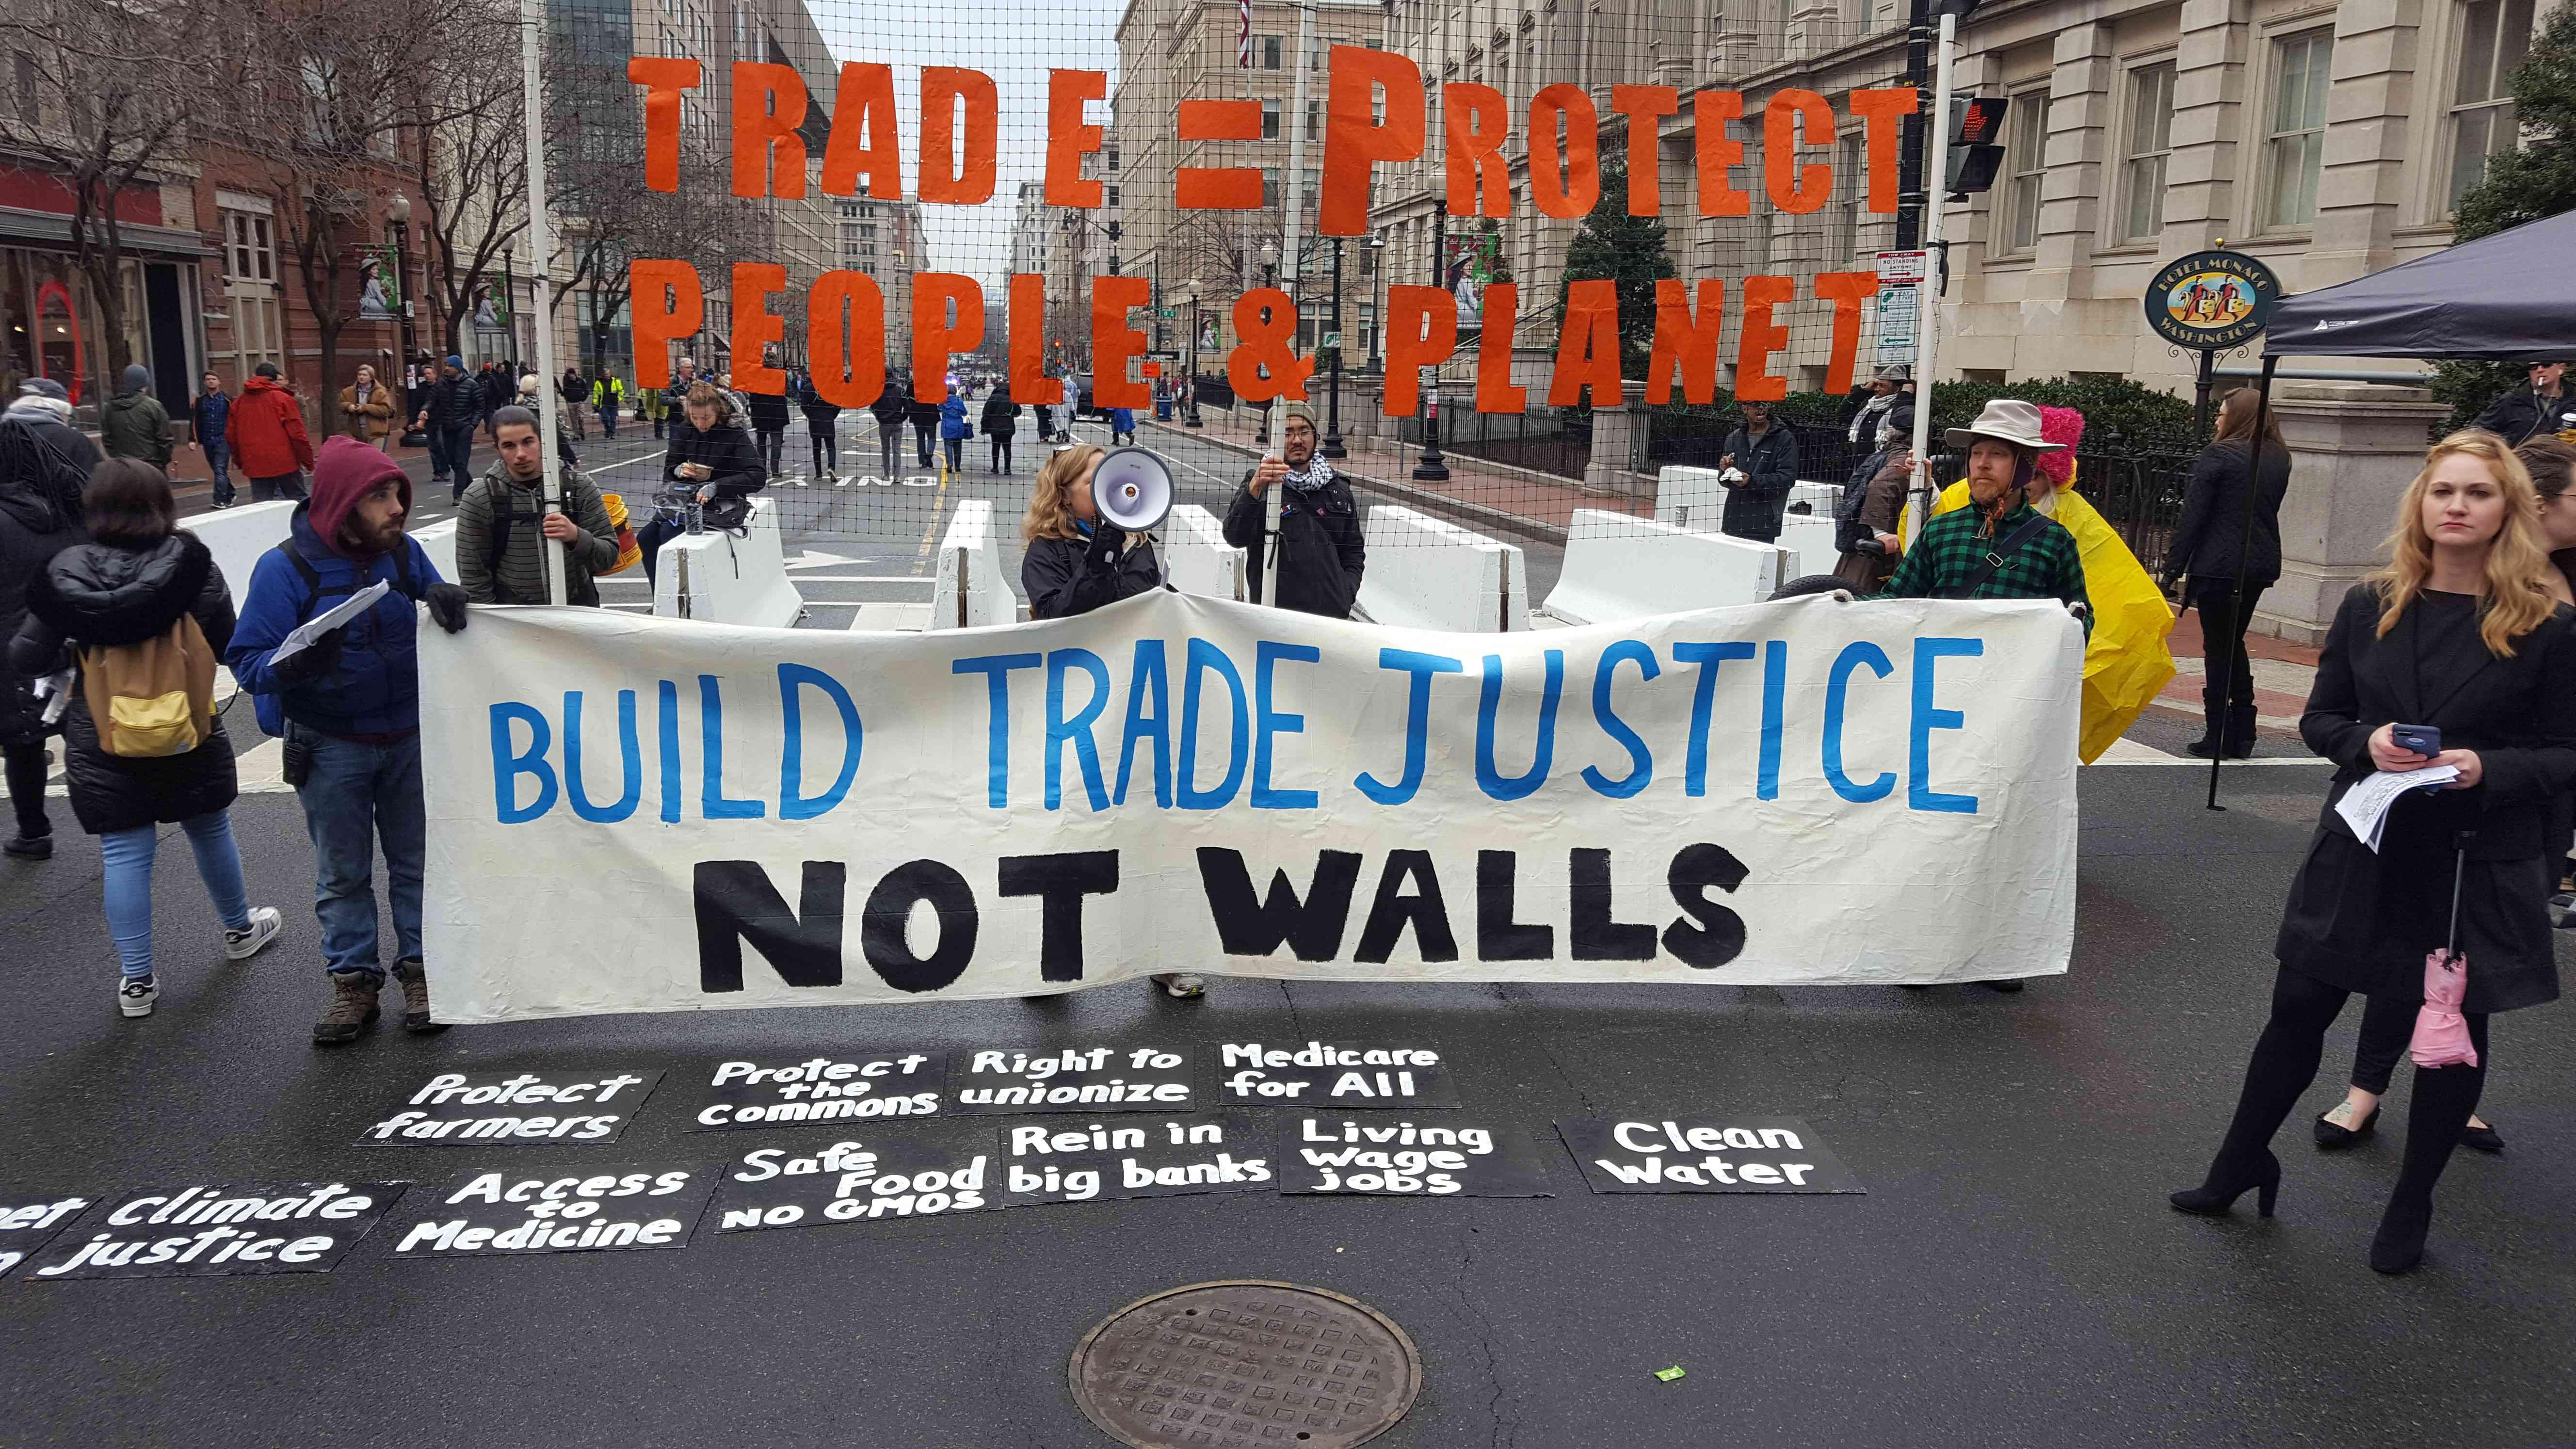 President Trump's Statement On Trade